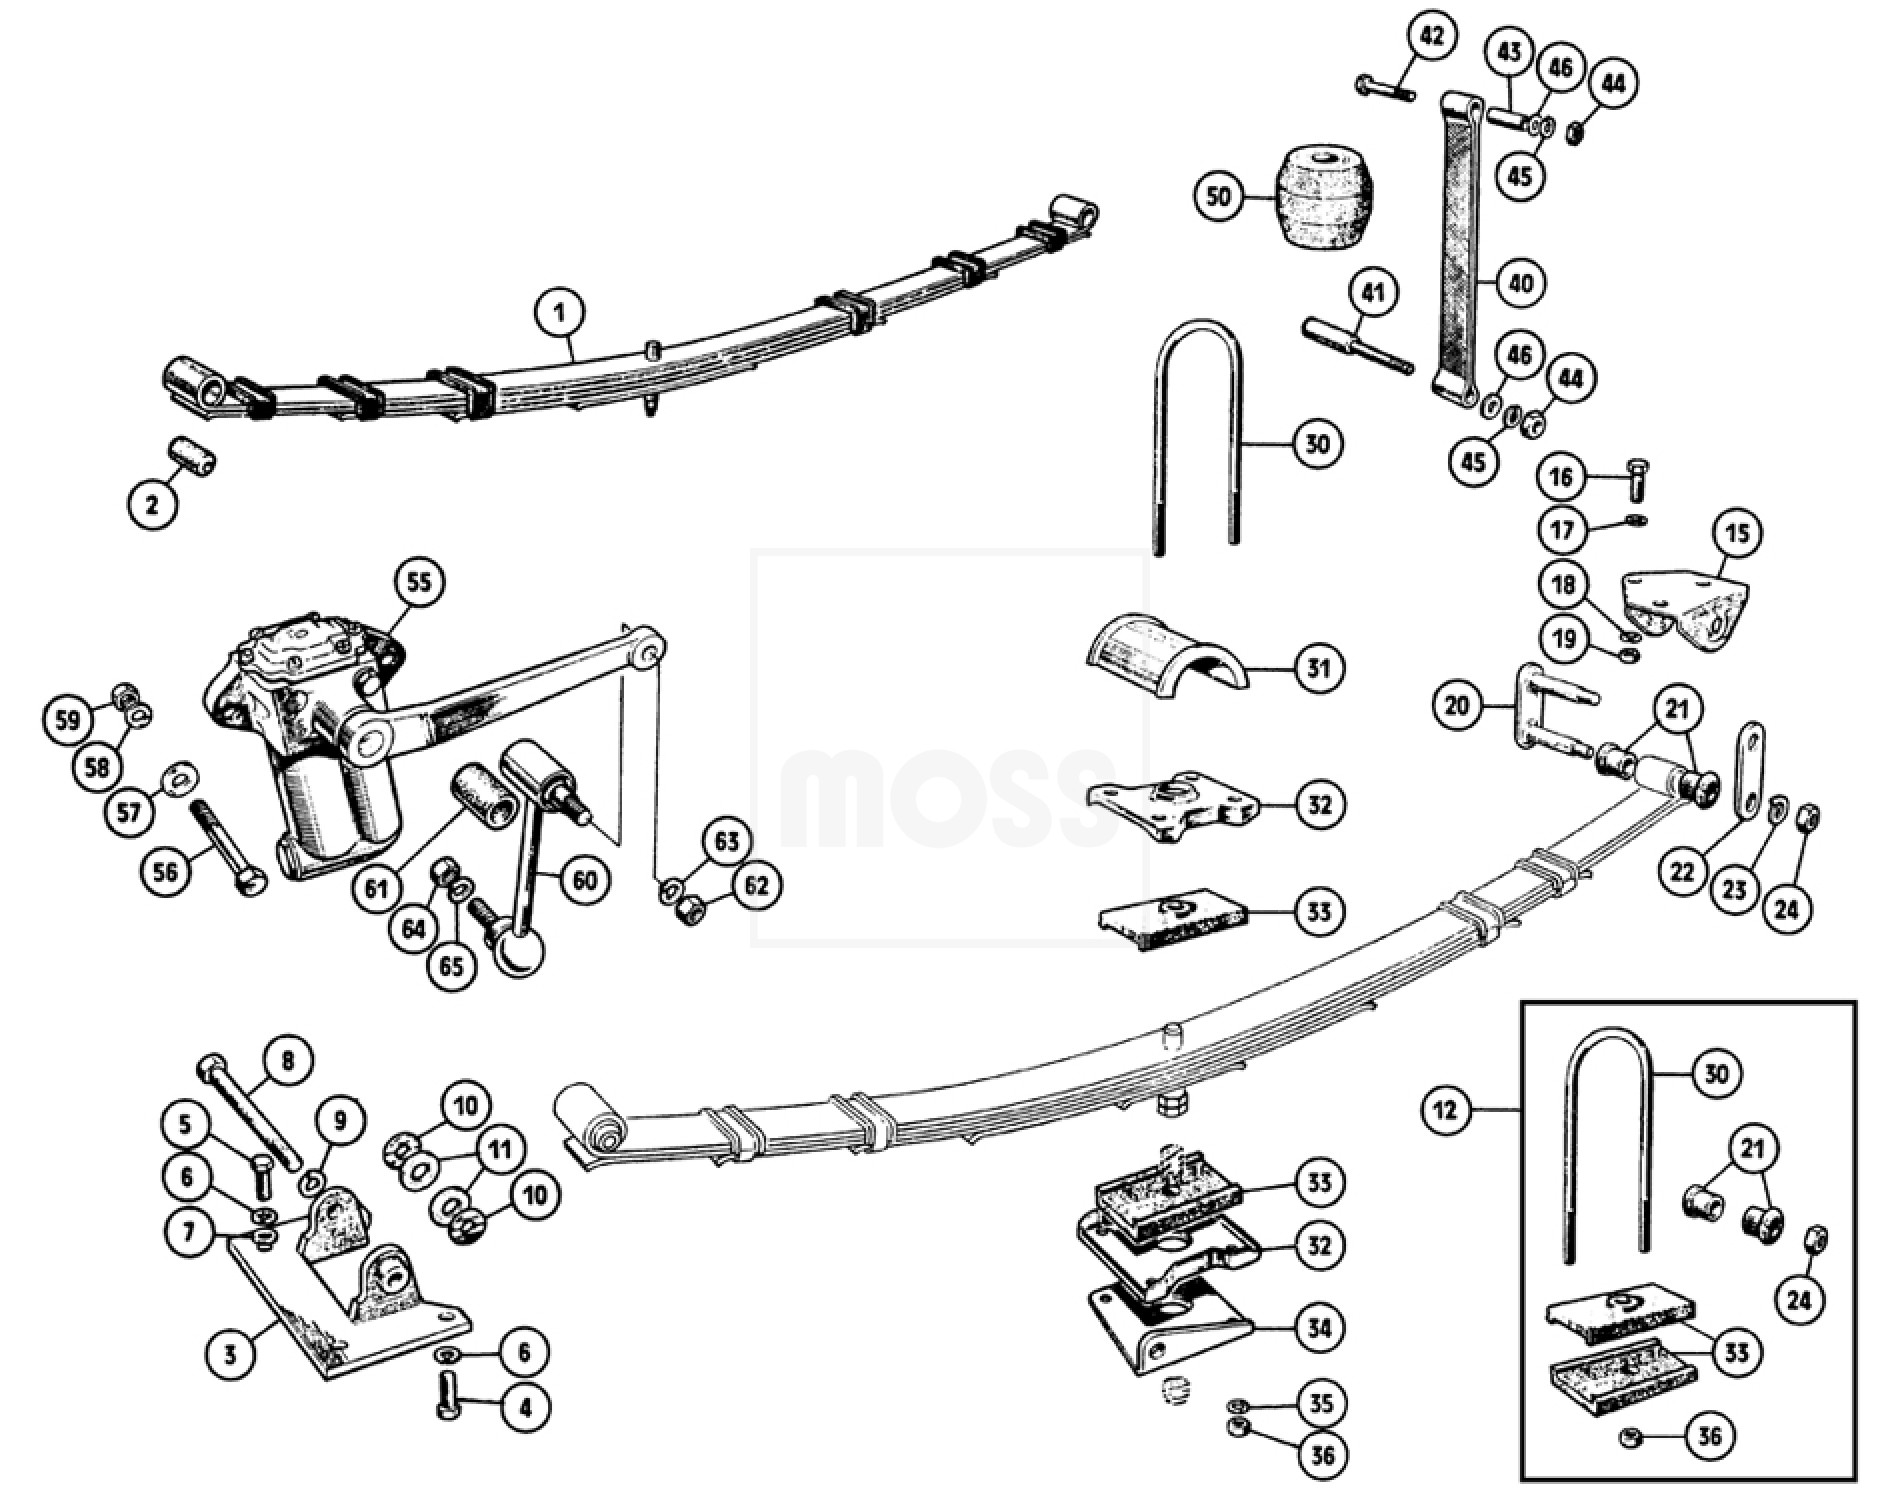 Full Wiring Diagram 1960 Austin Healey